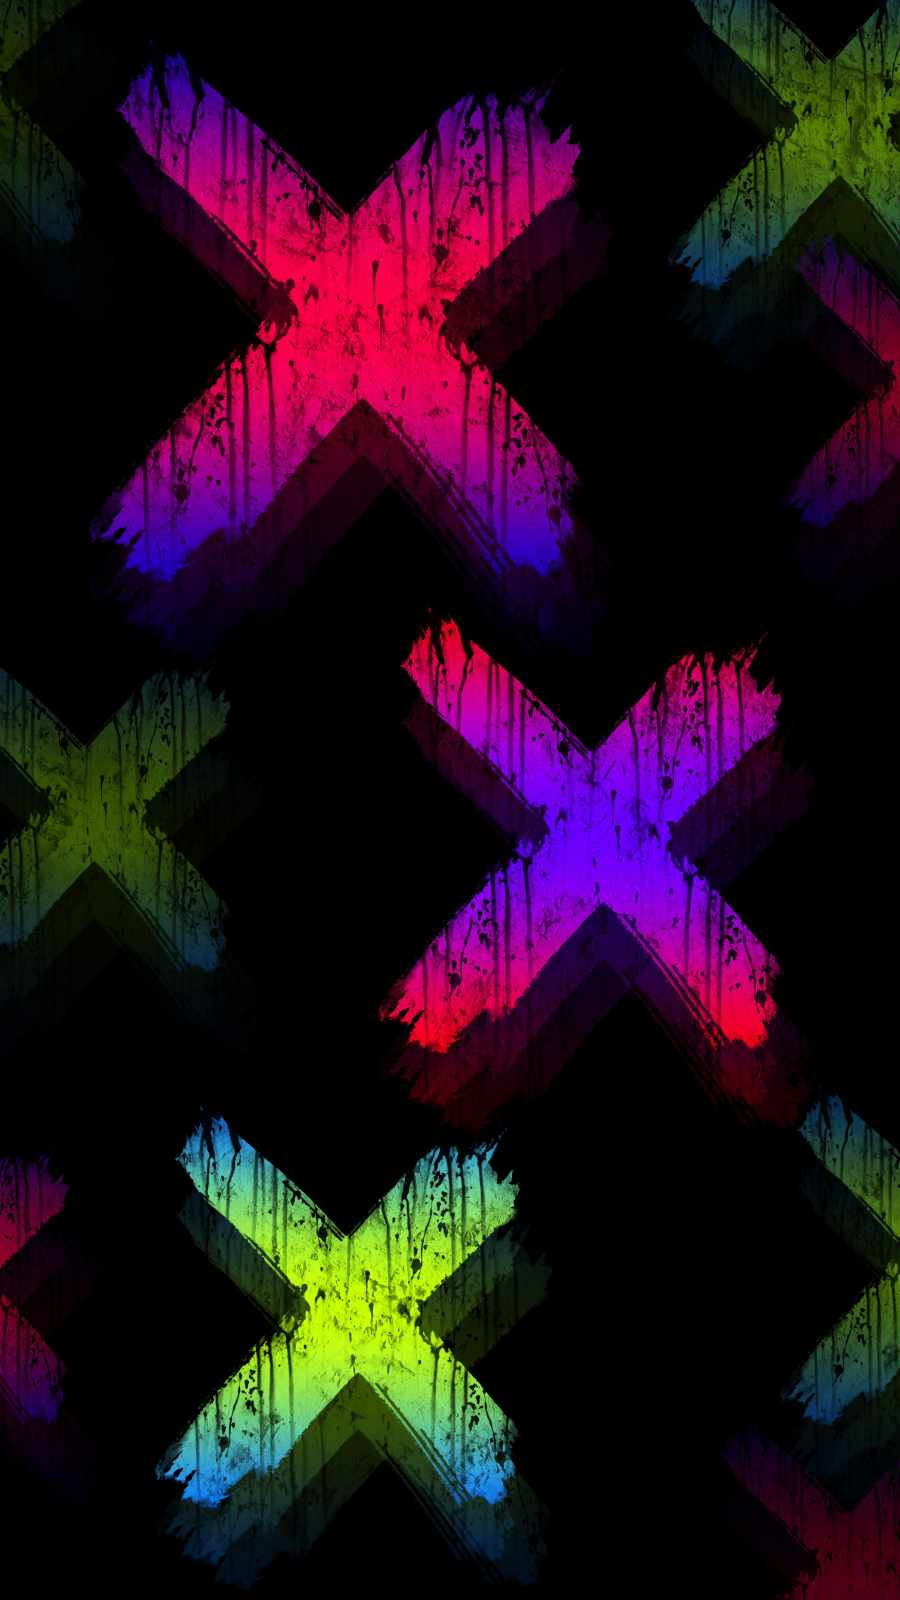 Amoled X Colorful